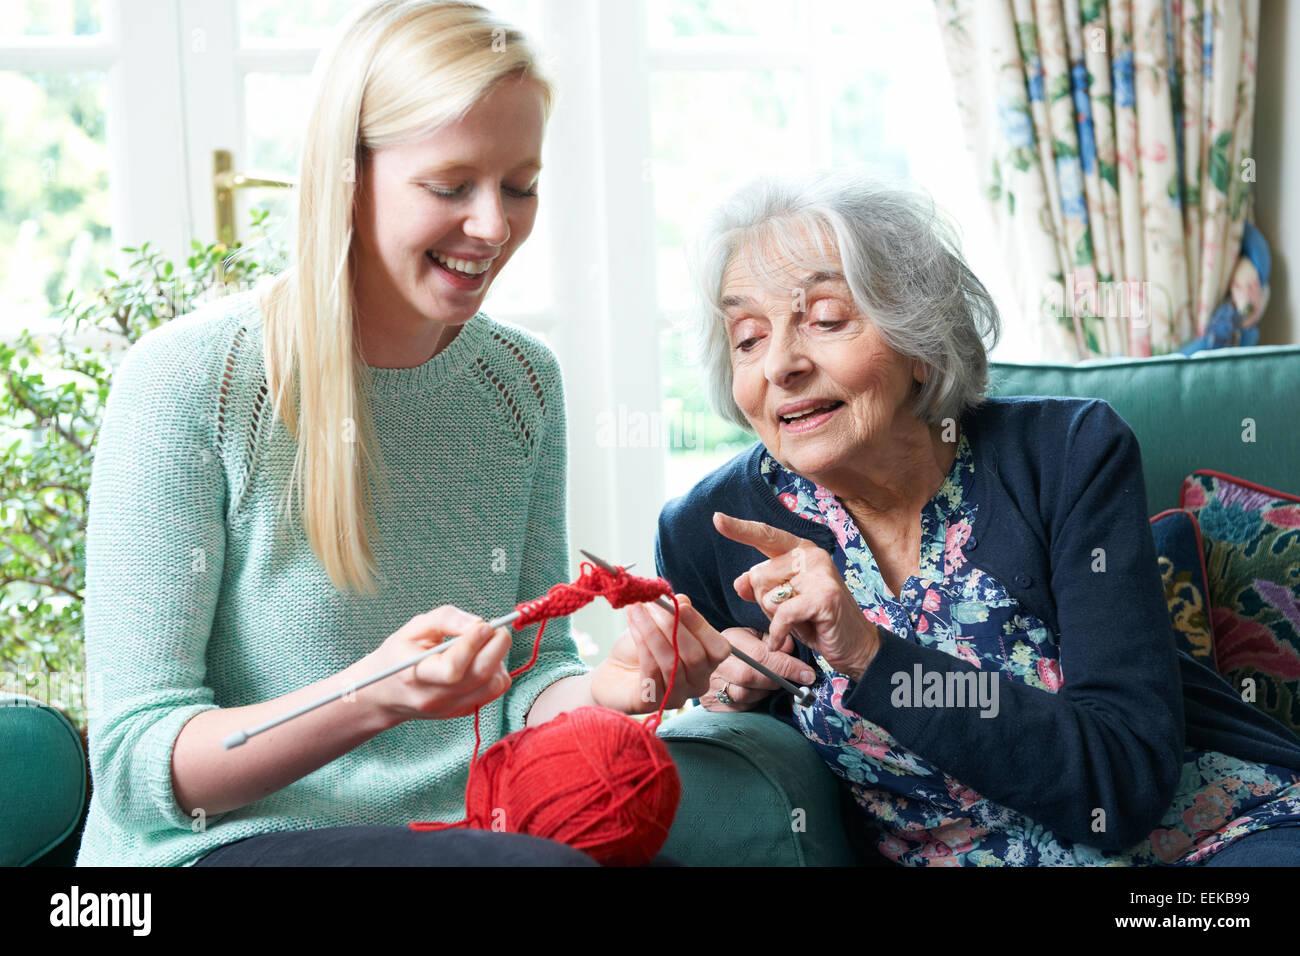 Grand-mère-fille montrant comment tricoter Photo Stock